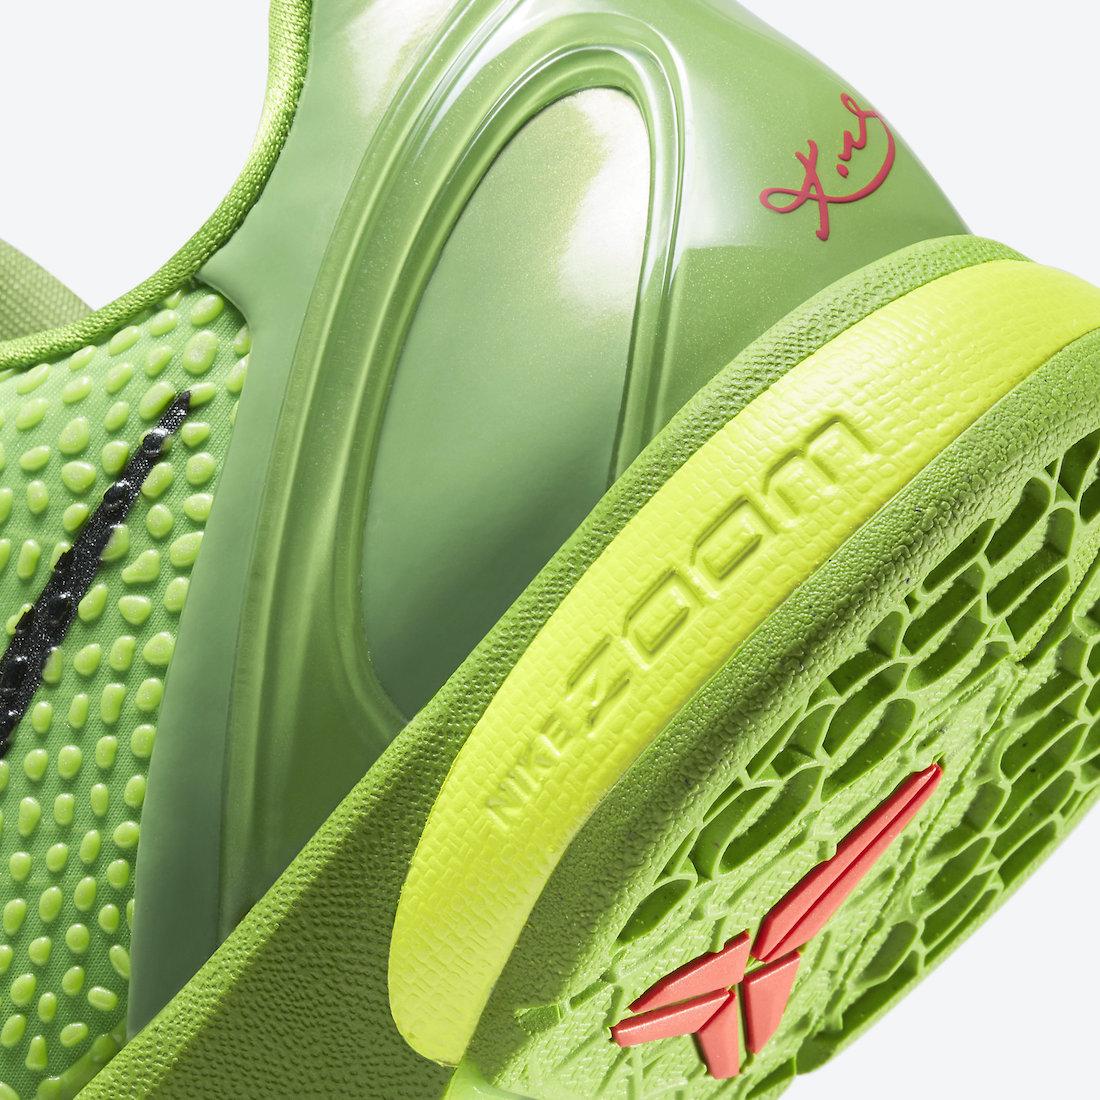 Nike-Kobe-6-Protro-Grinch-CW2190-300-Release-Date-Price-7